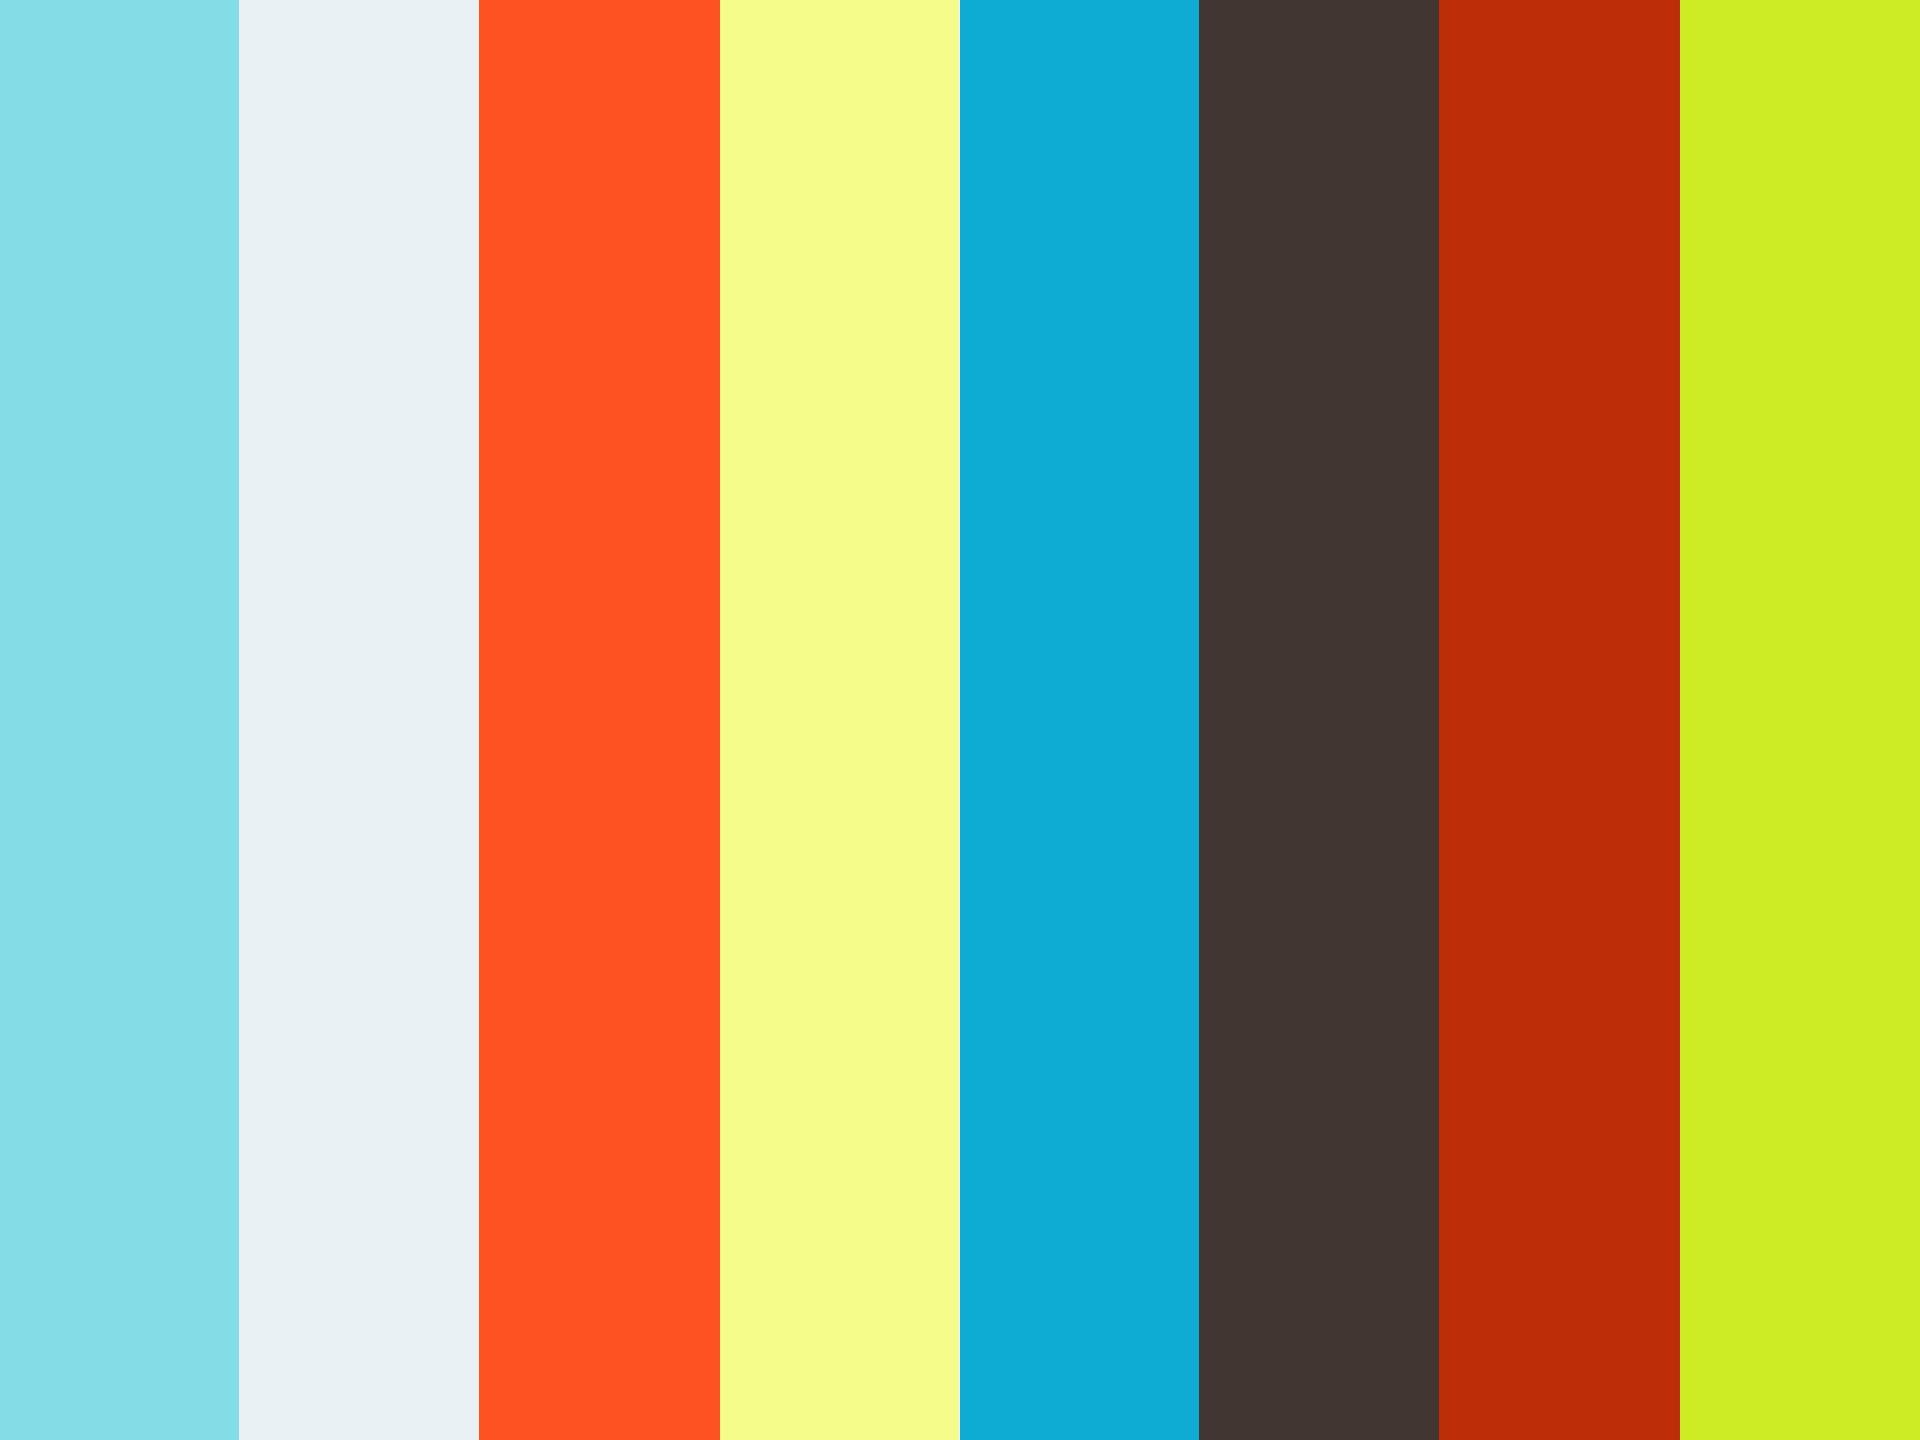 MERCEDES BENZ GLA 250 - RED - 2019